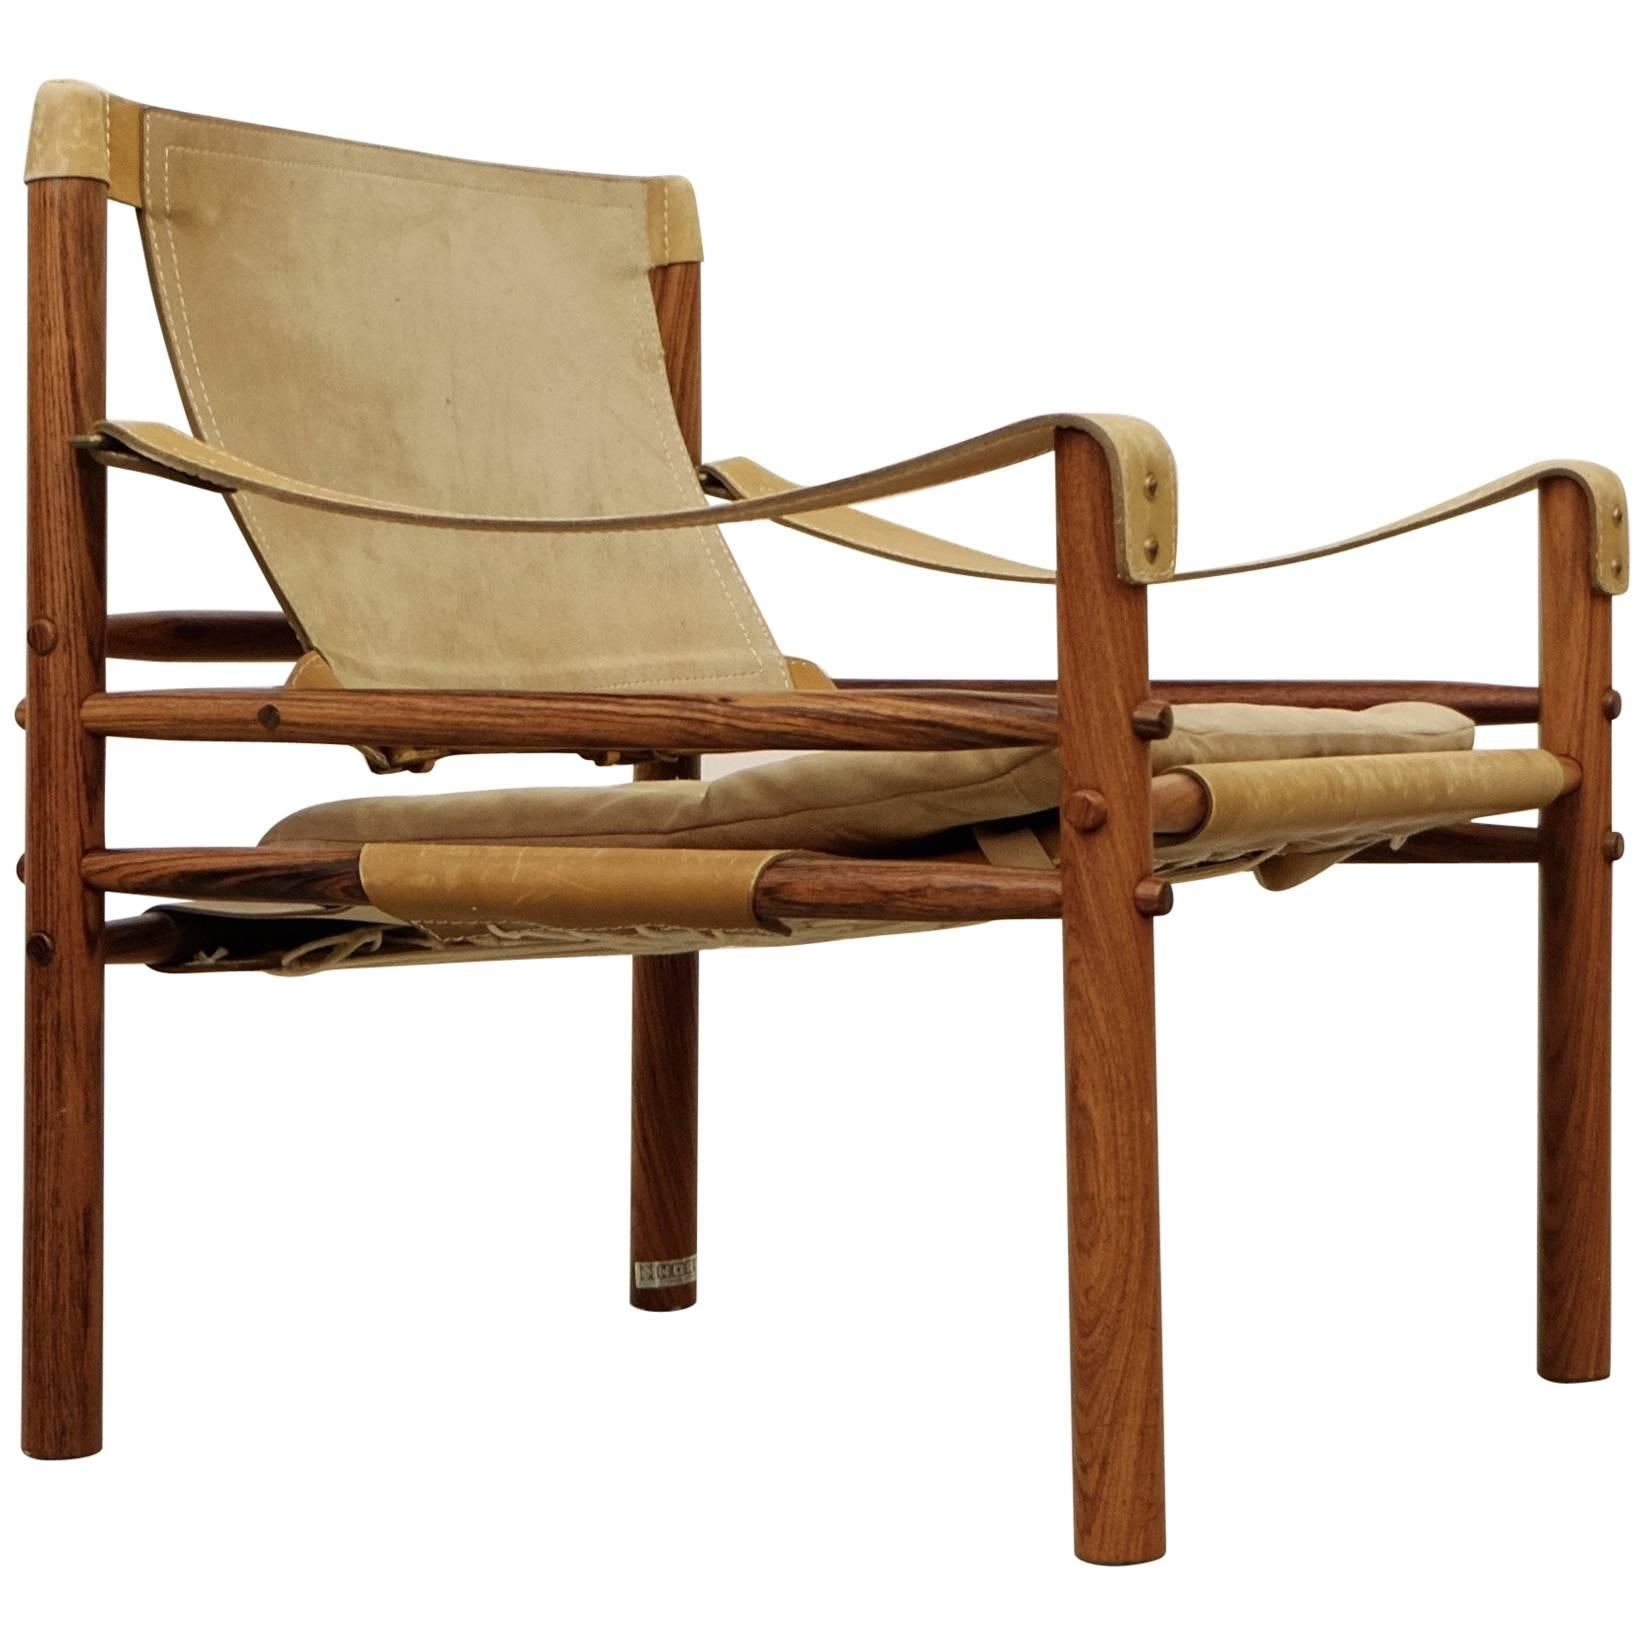 Exceptionnel Arne Norell Safari Chair Model Sirocco, 1960s